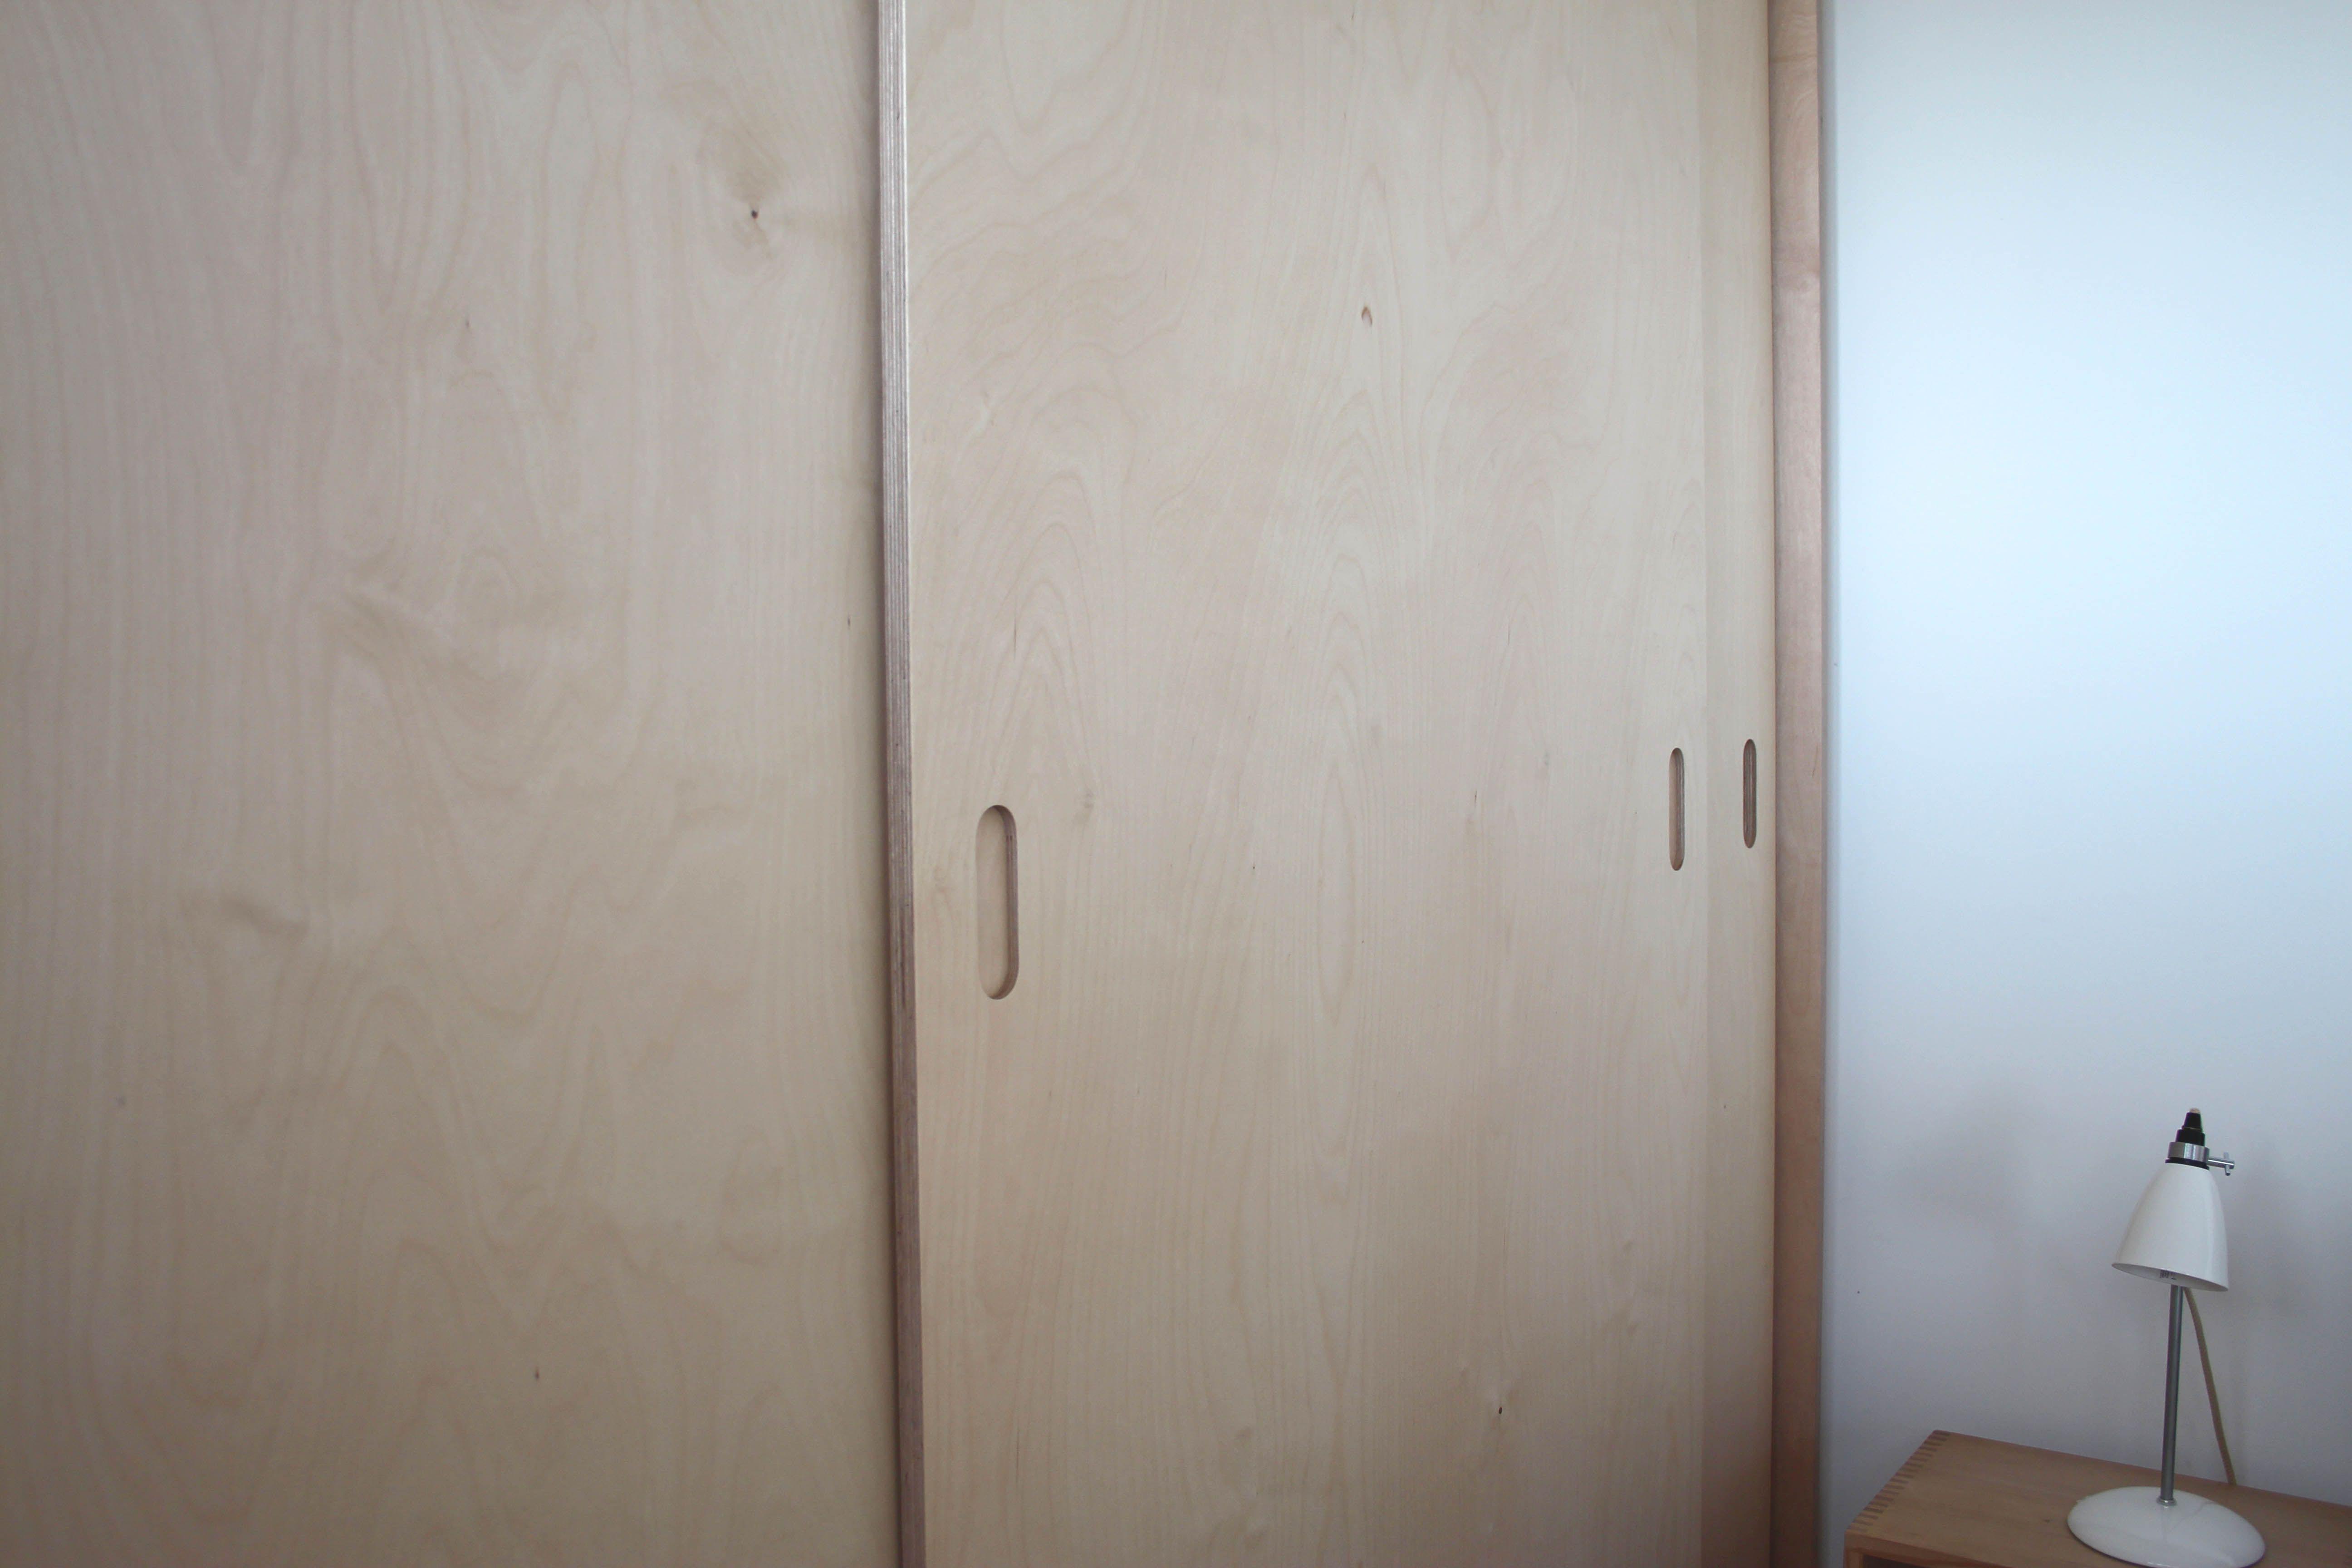 Replacement Kitchen Cupboard Doors Sliding Doors Birch Plywood Wardrobe Designed By 1934 In 2020 Wardrobe Doors Bedroom Cupboard Doors Wooden Bedroom